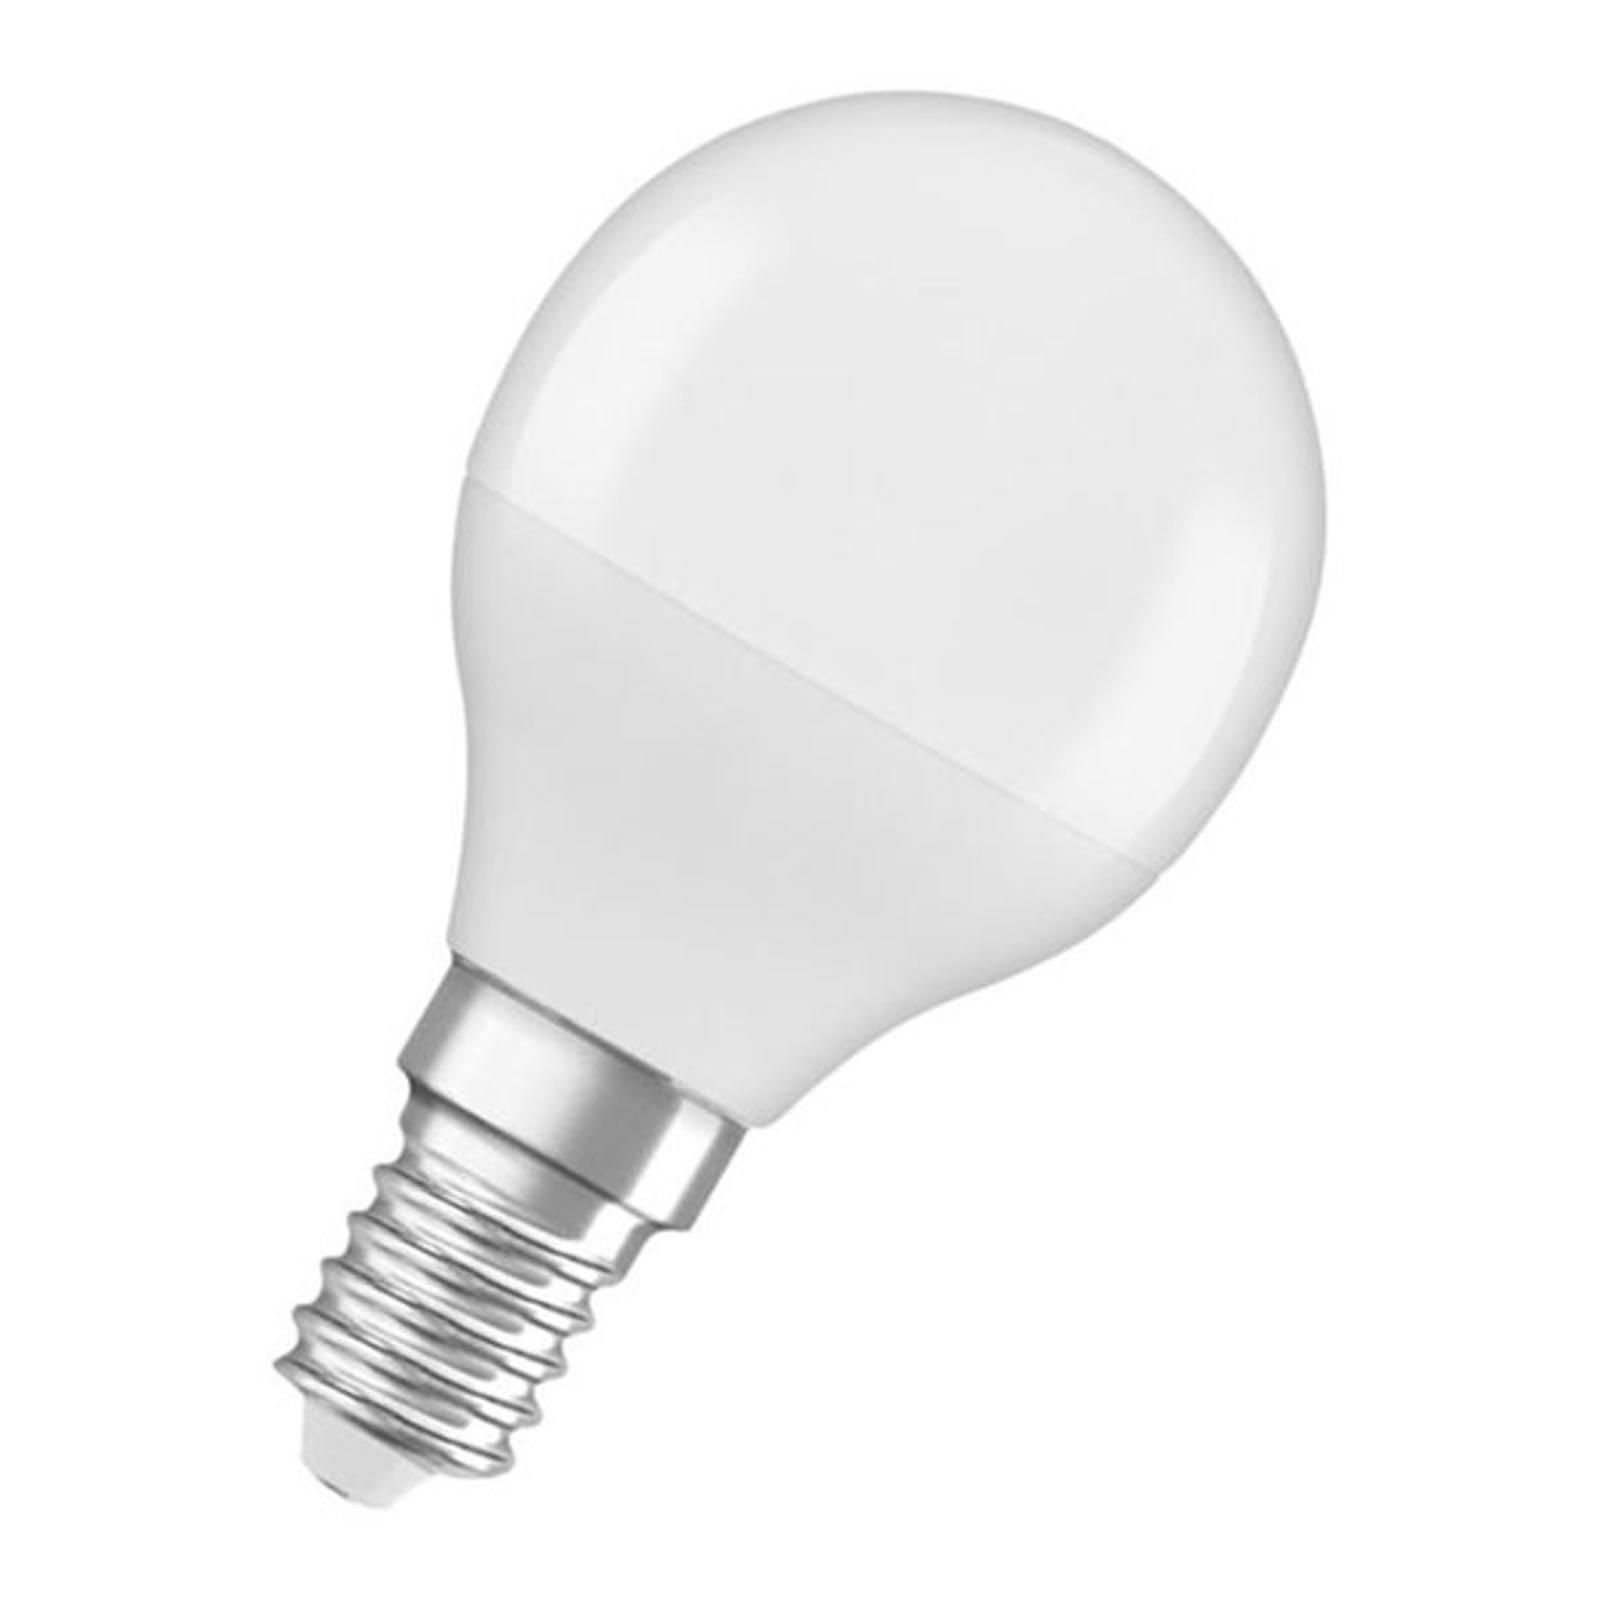 OSRAM LED-Tropfenlampe E14 5,5W 827 Star, matt